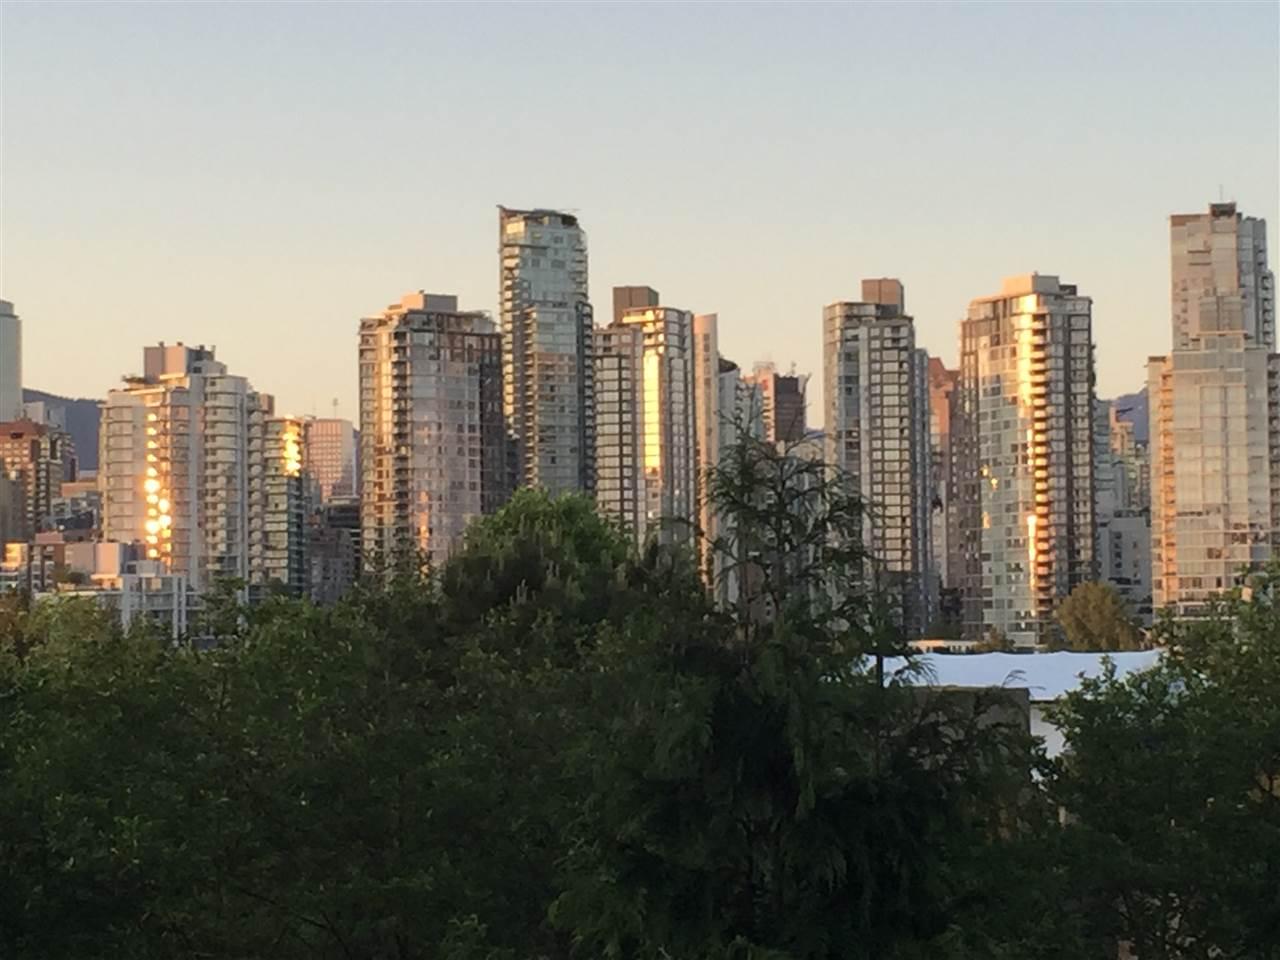 Condo Apartment at 205 1365 W 4TH AVENUE, Unit 205, Vancouver West, British Columbia. Image 1